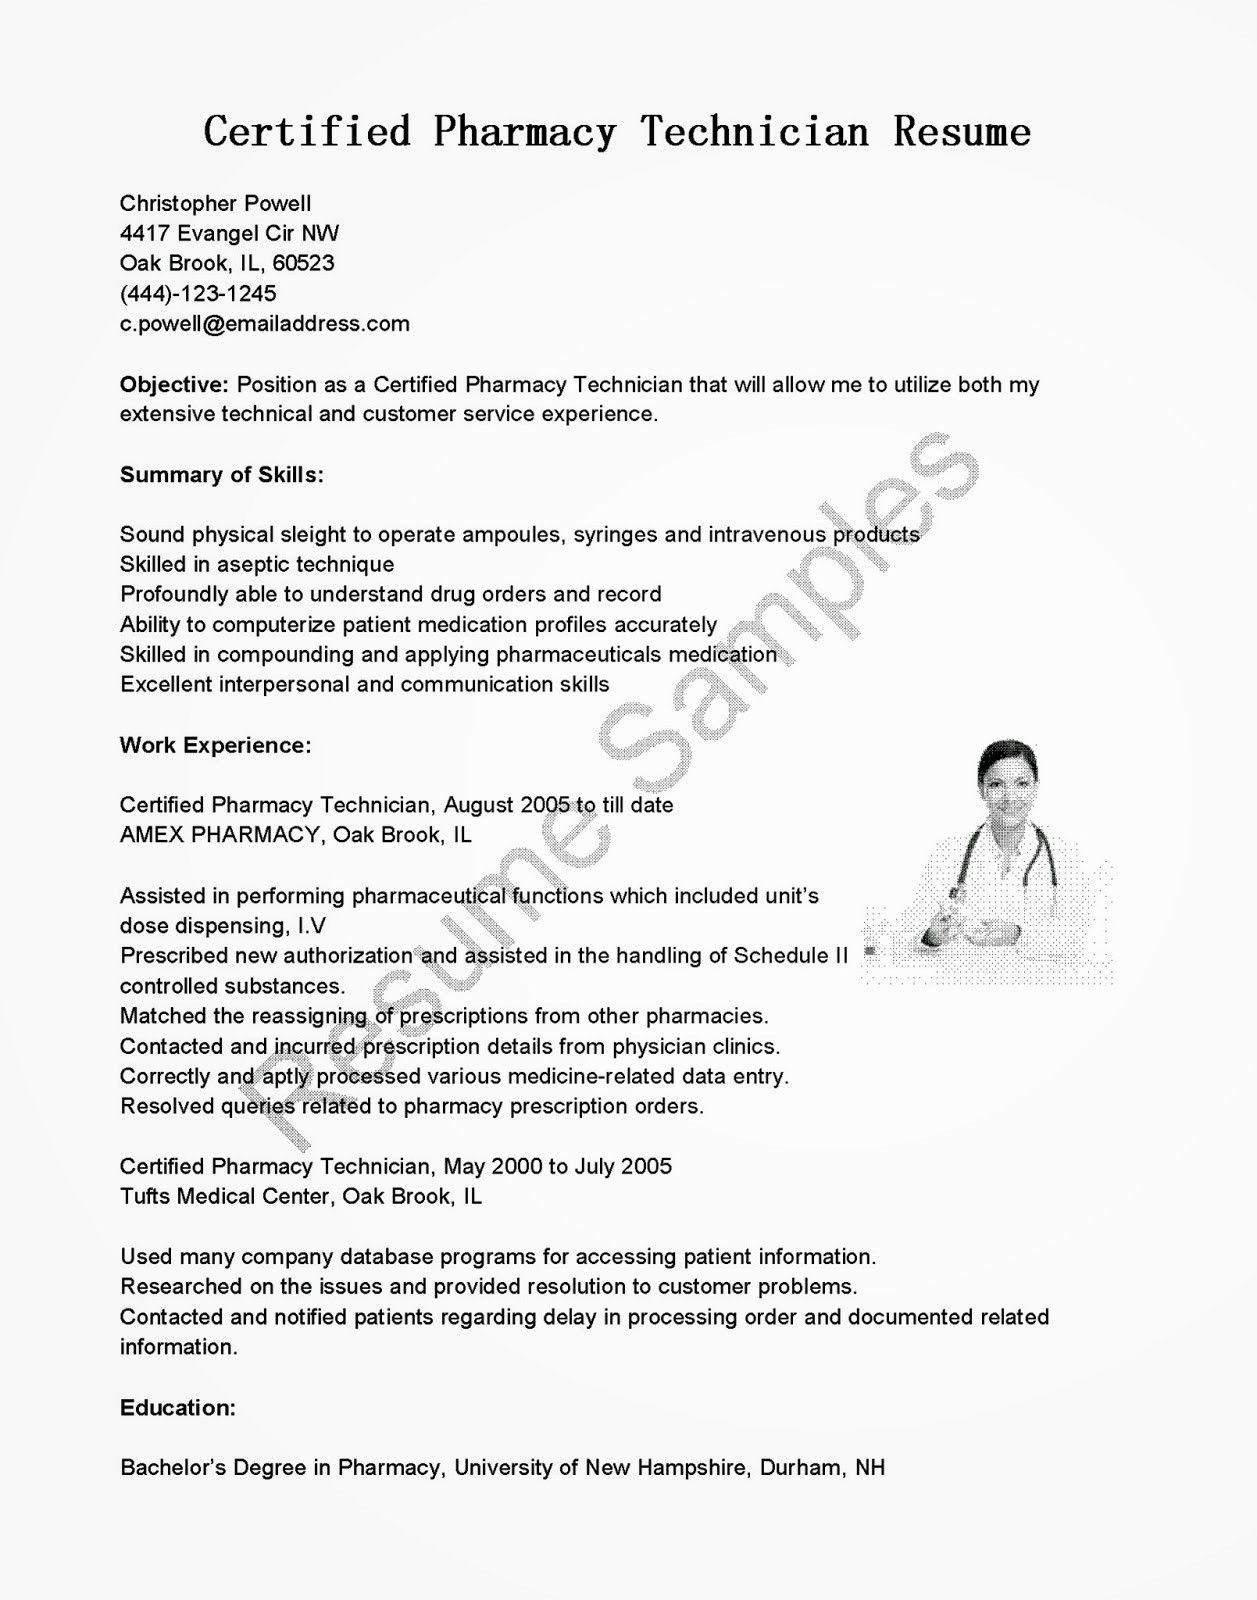 Elegant Resume Samples Certified Pharmacy Technician